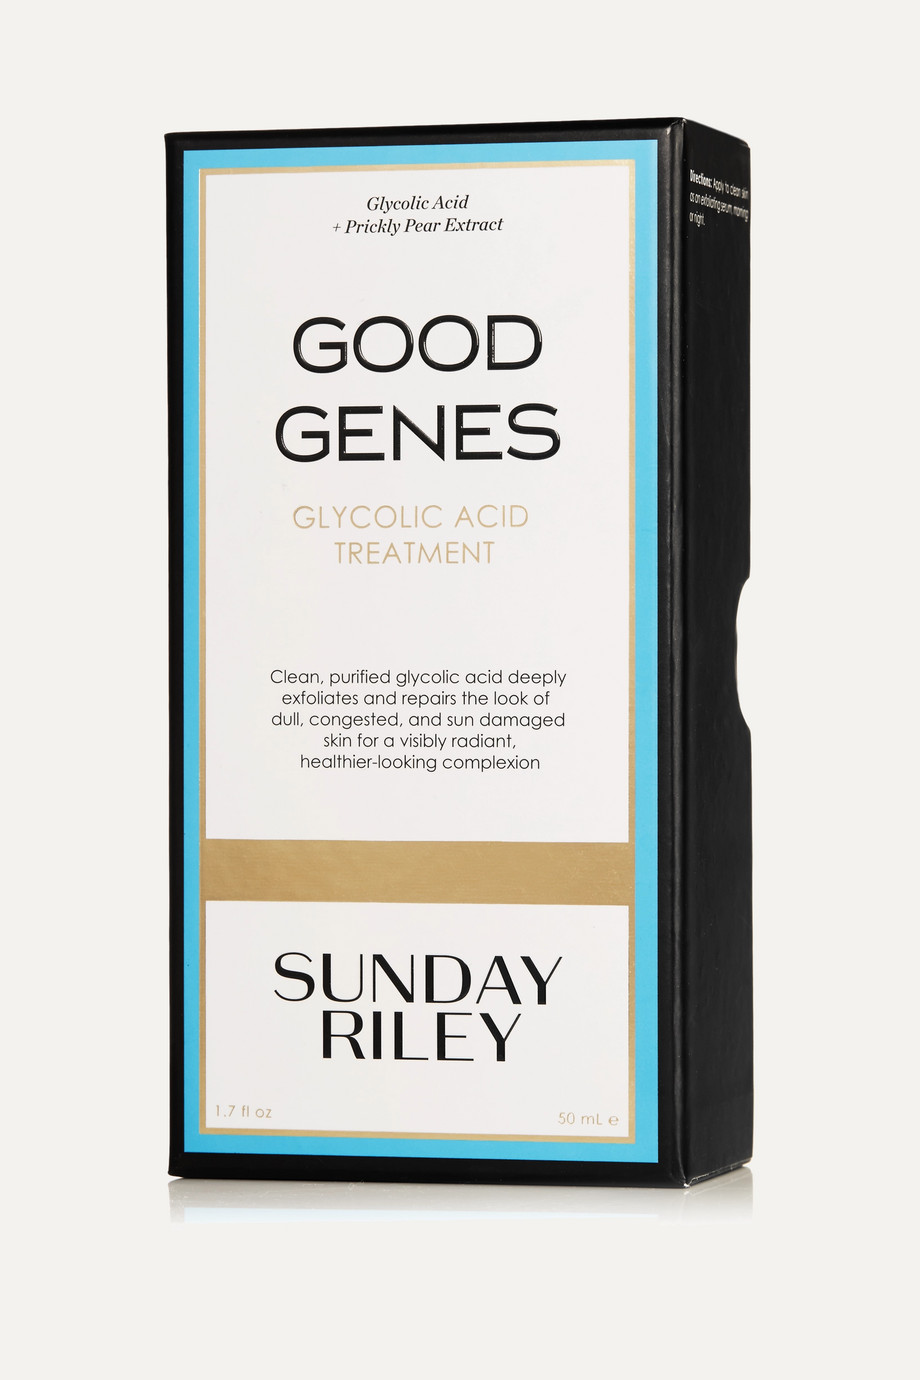 Sunday Riley Good Genes Glycolic Acid Treatment, 50 ml – Serum